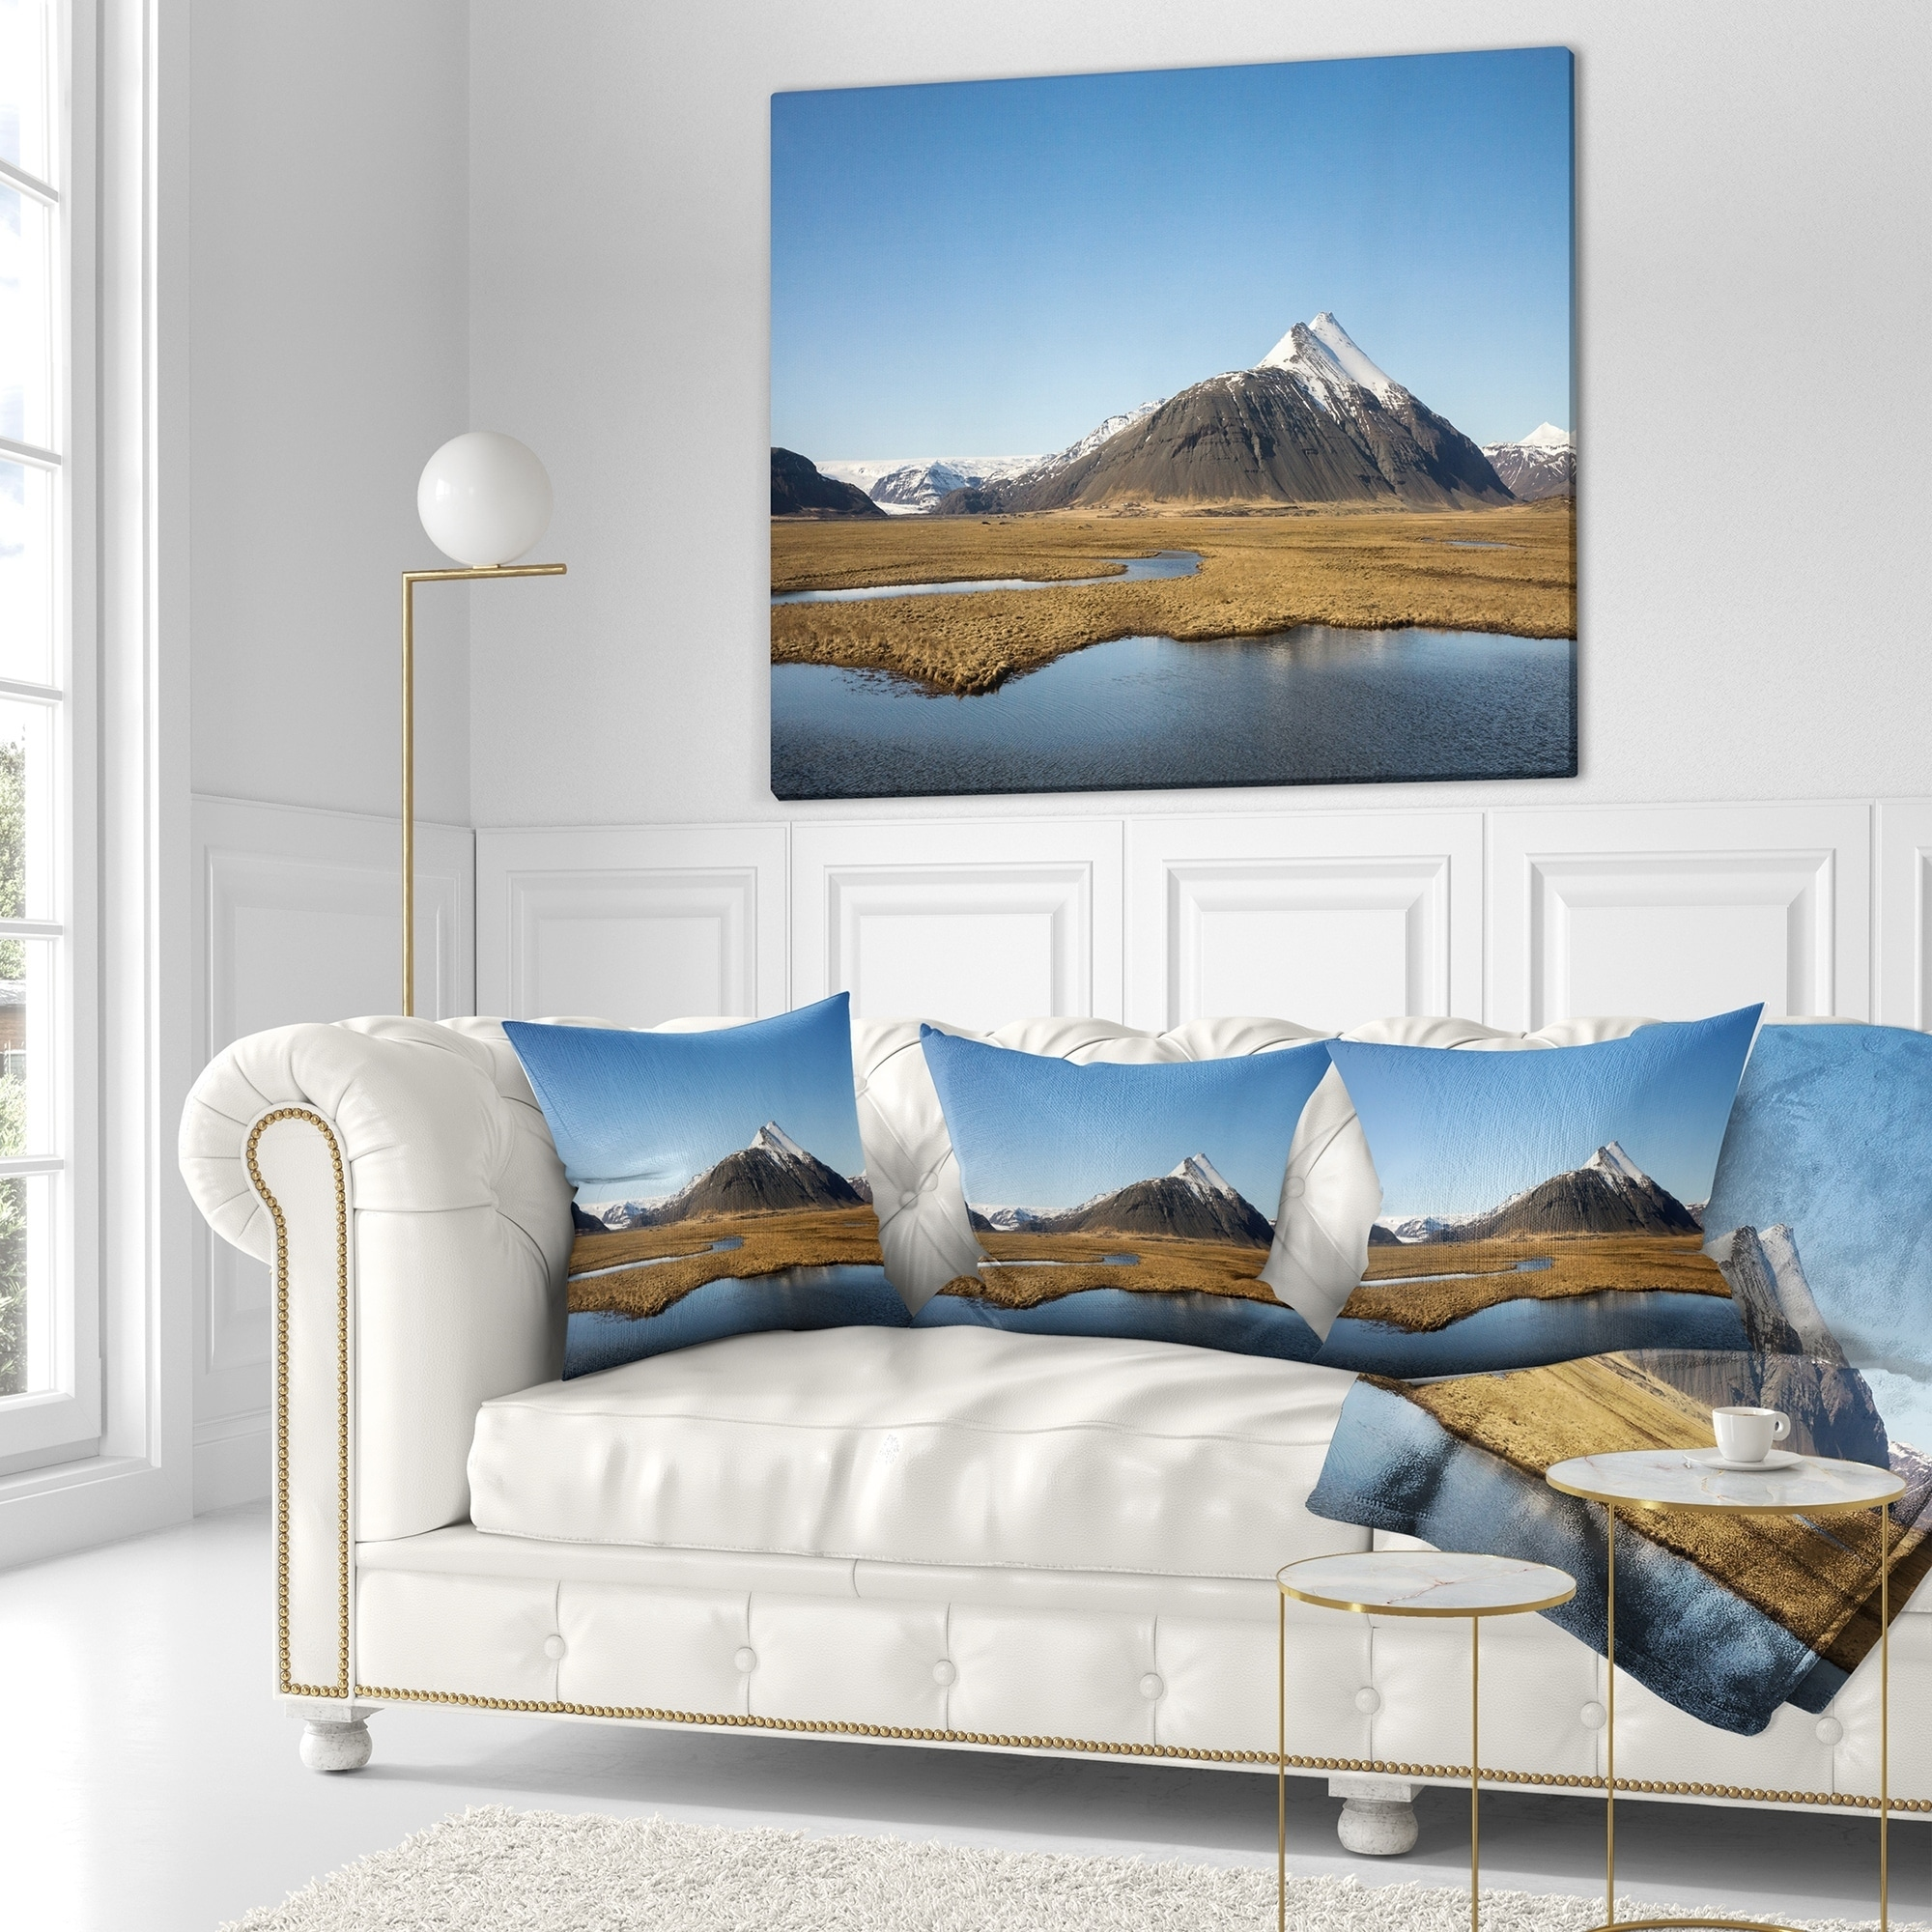 Design Art Designart Scenic Southern Iceland Landscape Photography Throw Pillow Walmart Com Walmart Com